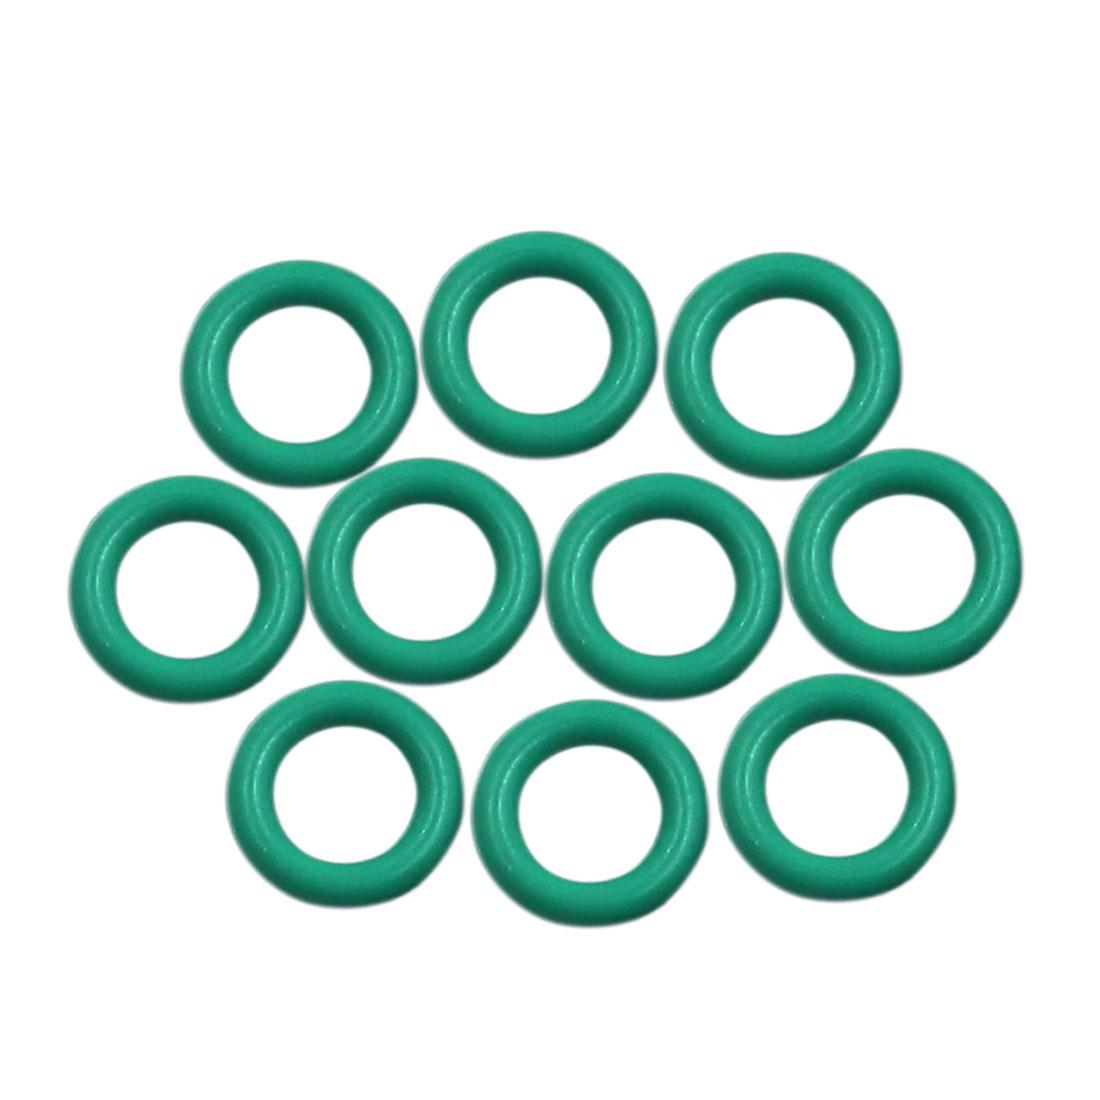 10pcs Green Universal FKM O-Ring Sealing Gasket Washer for Car 9mm x 2mm